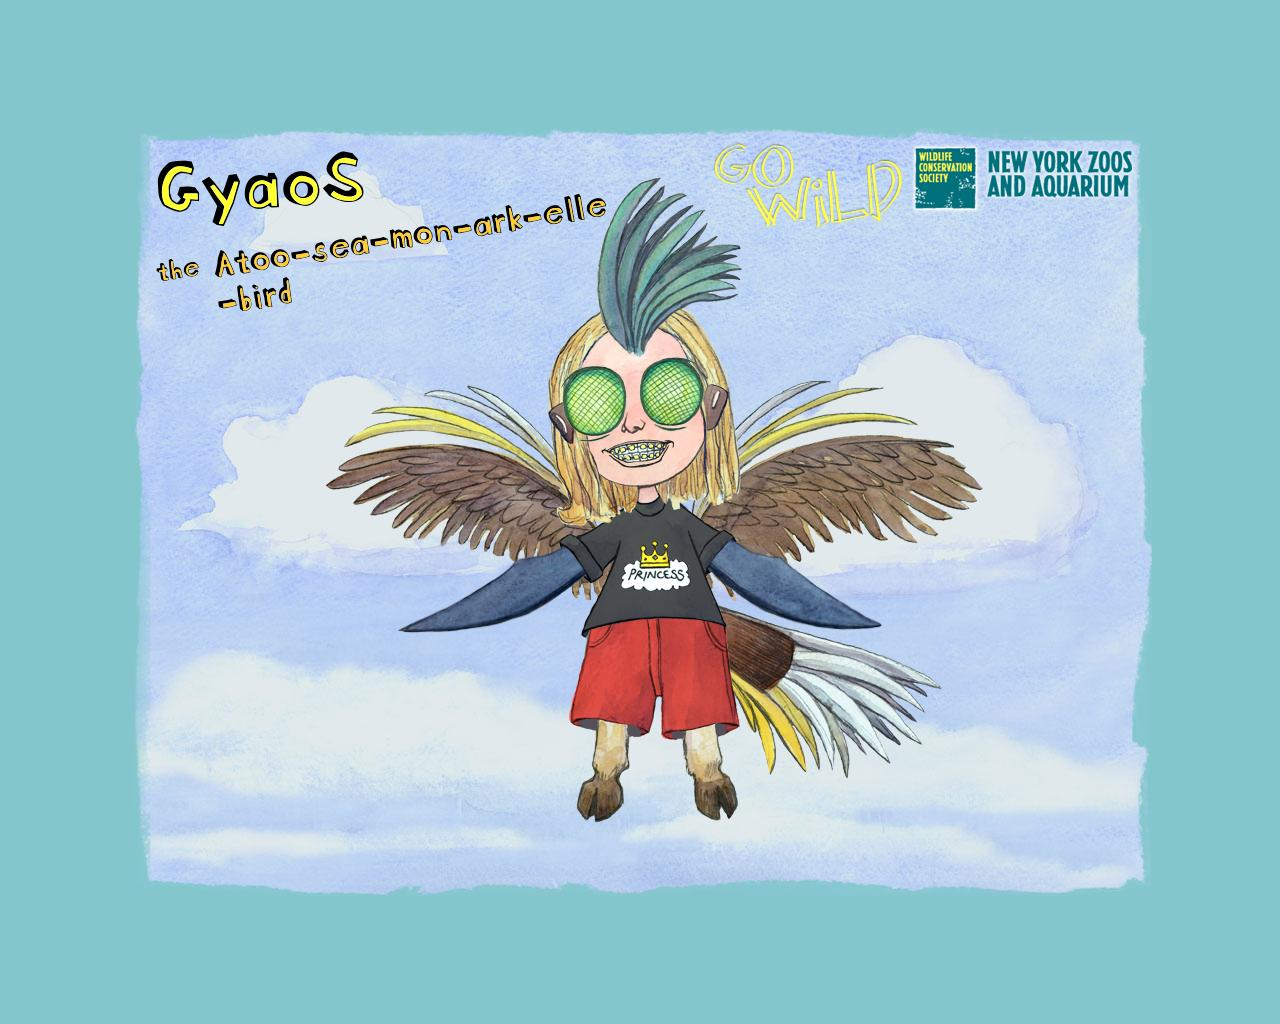 GyaoS